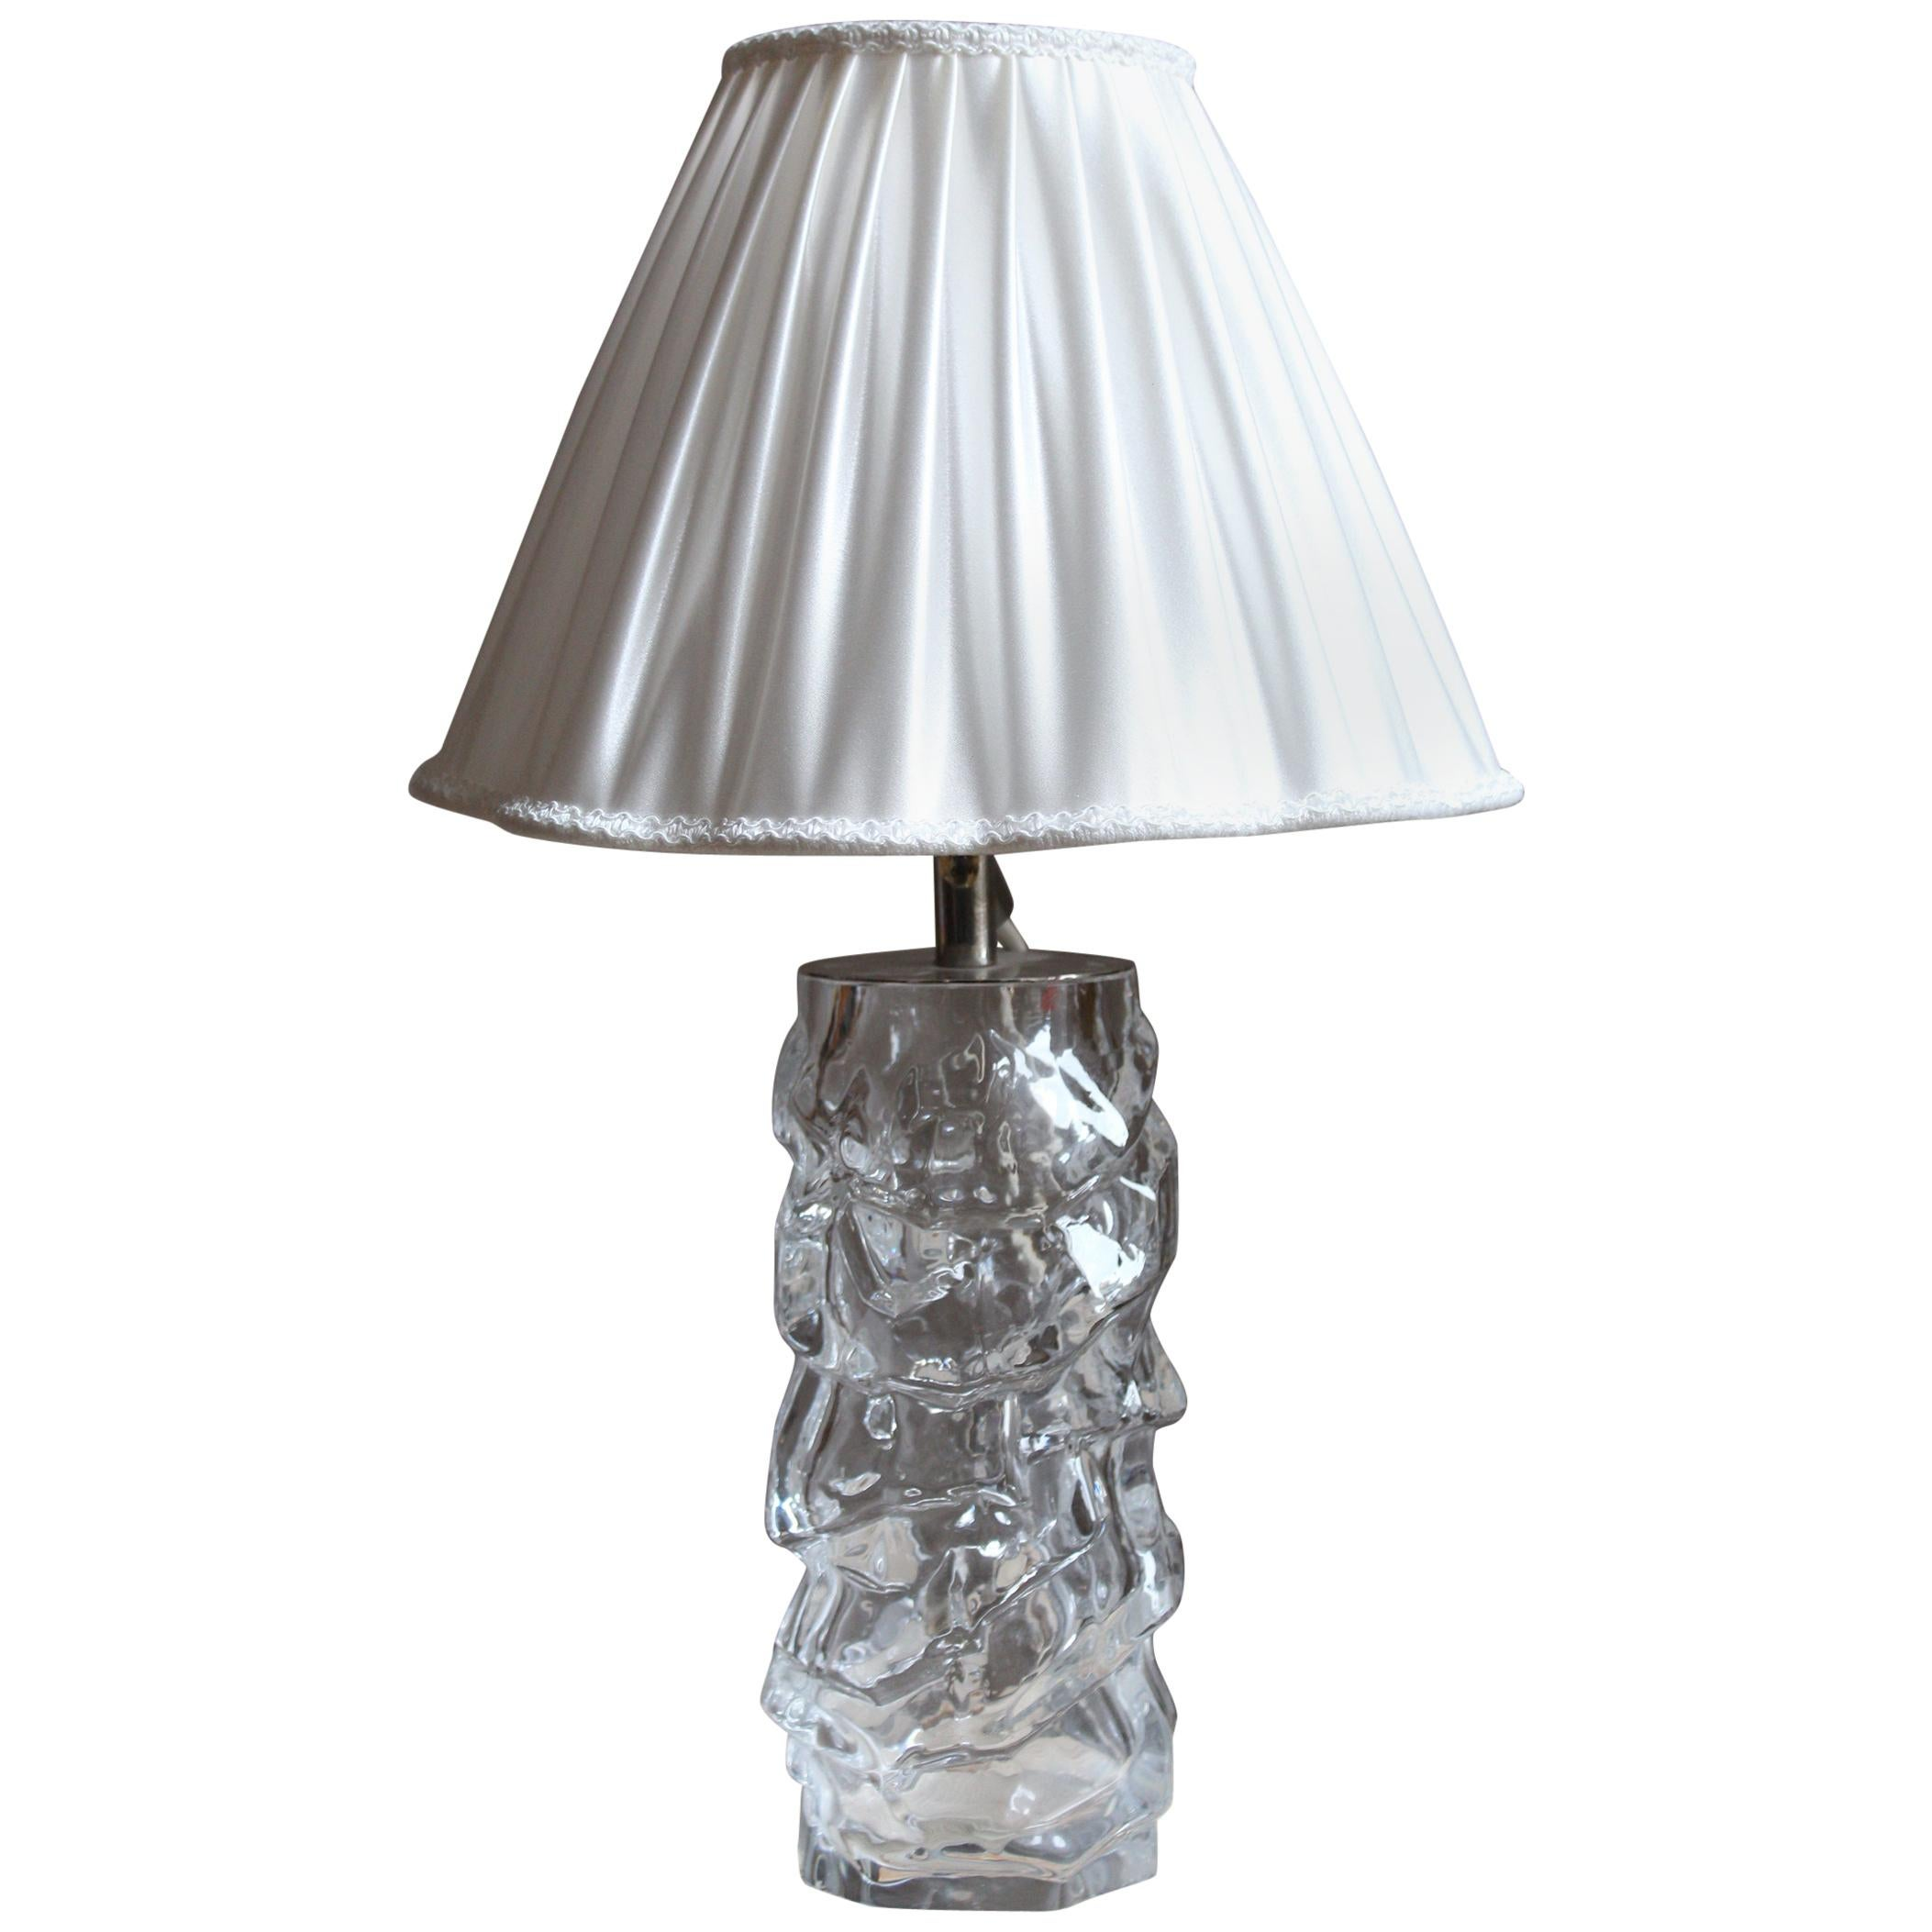 Reijmyre Glasbruk, Organic Table Lamp, Metal, Glas, Fabric, Sweden, 1940s